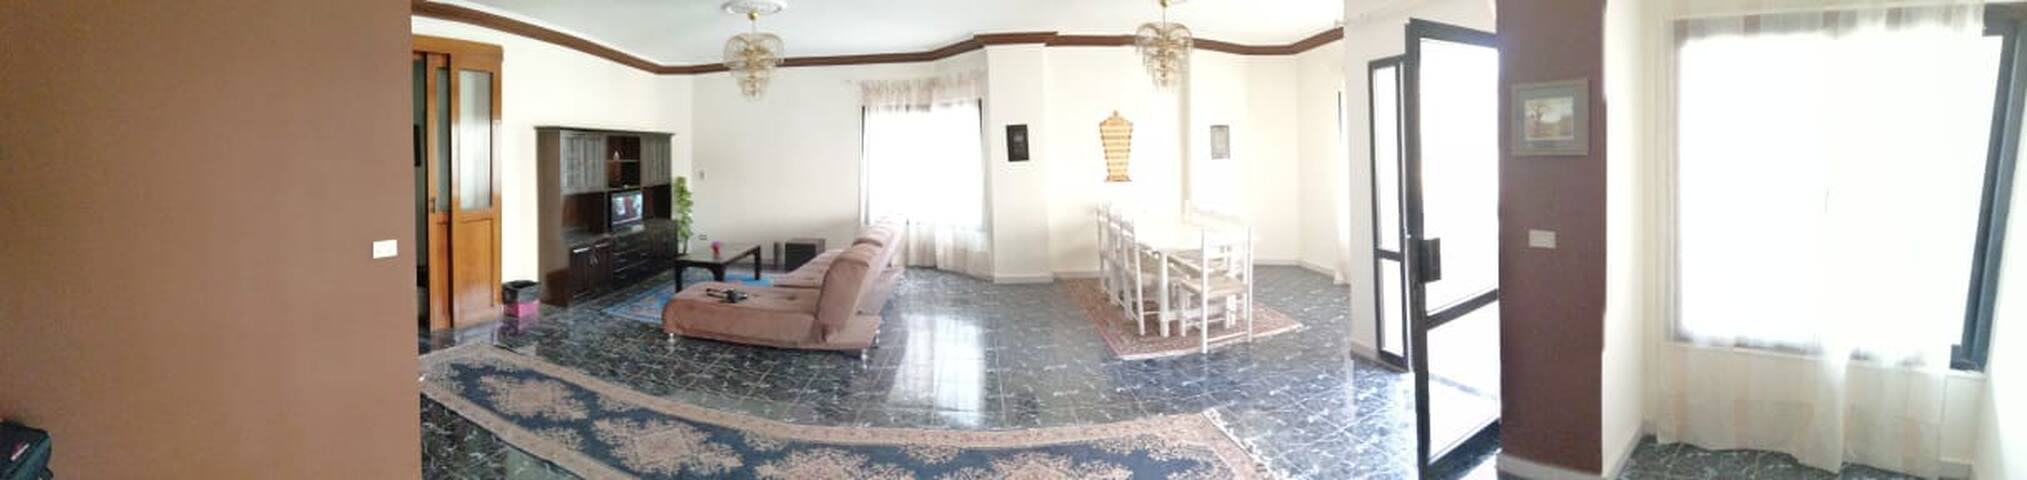 Nasr City  4 bedroom apartment